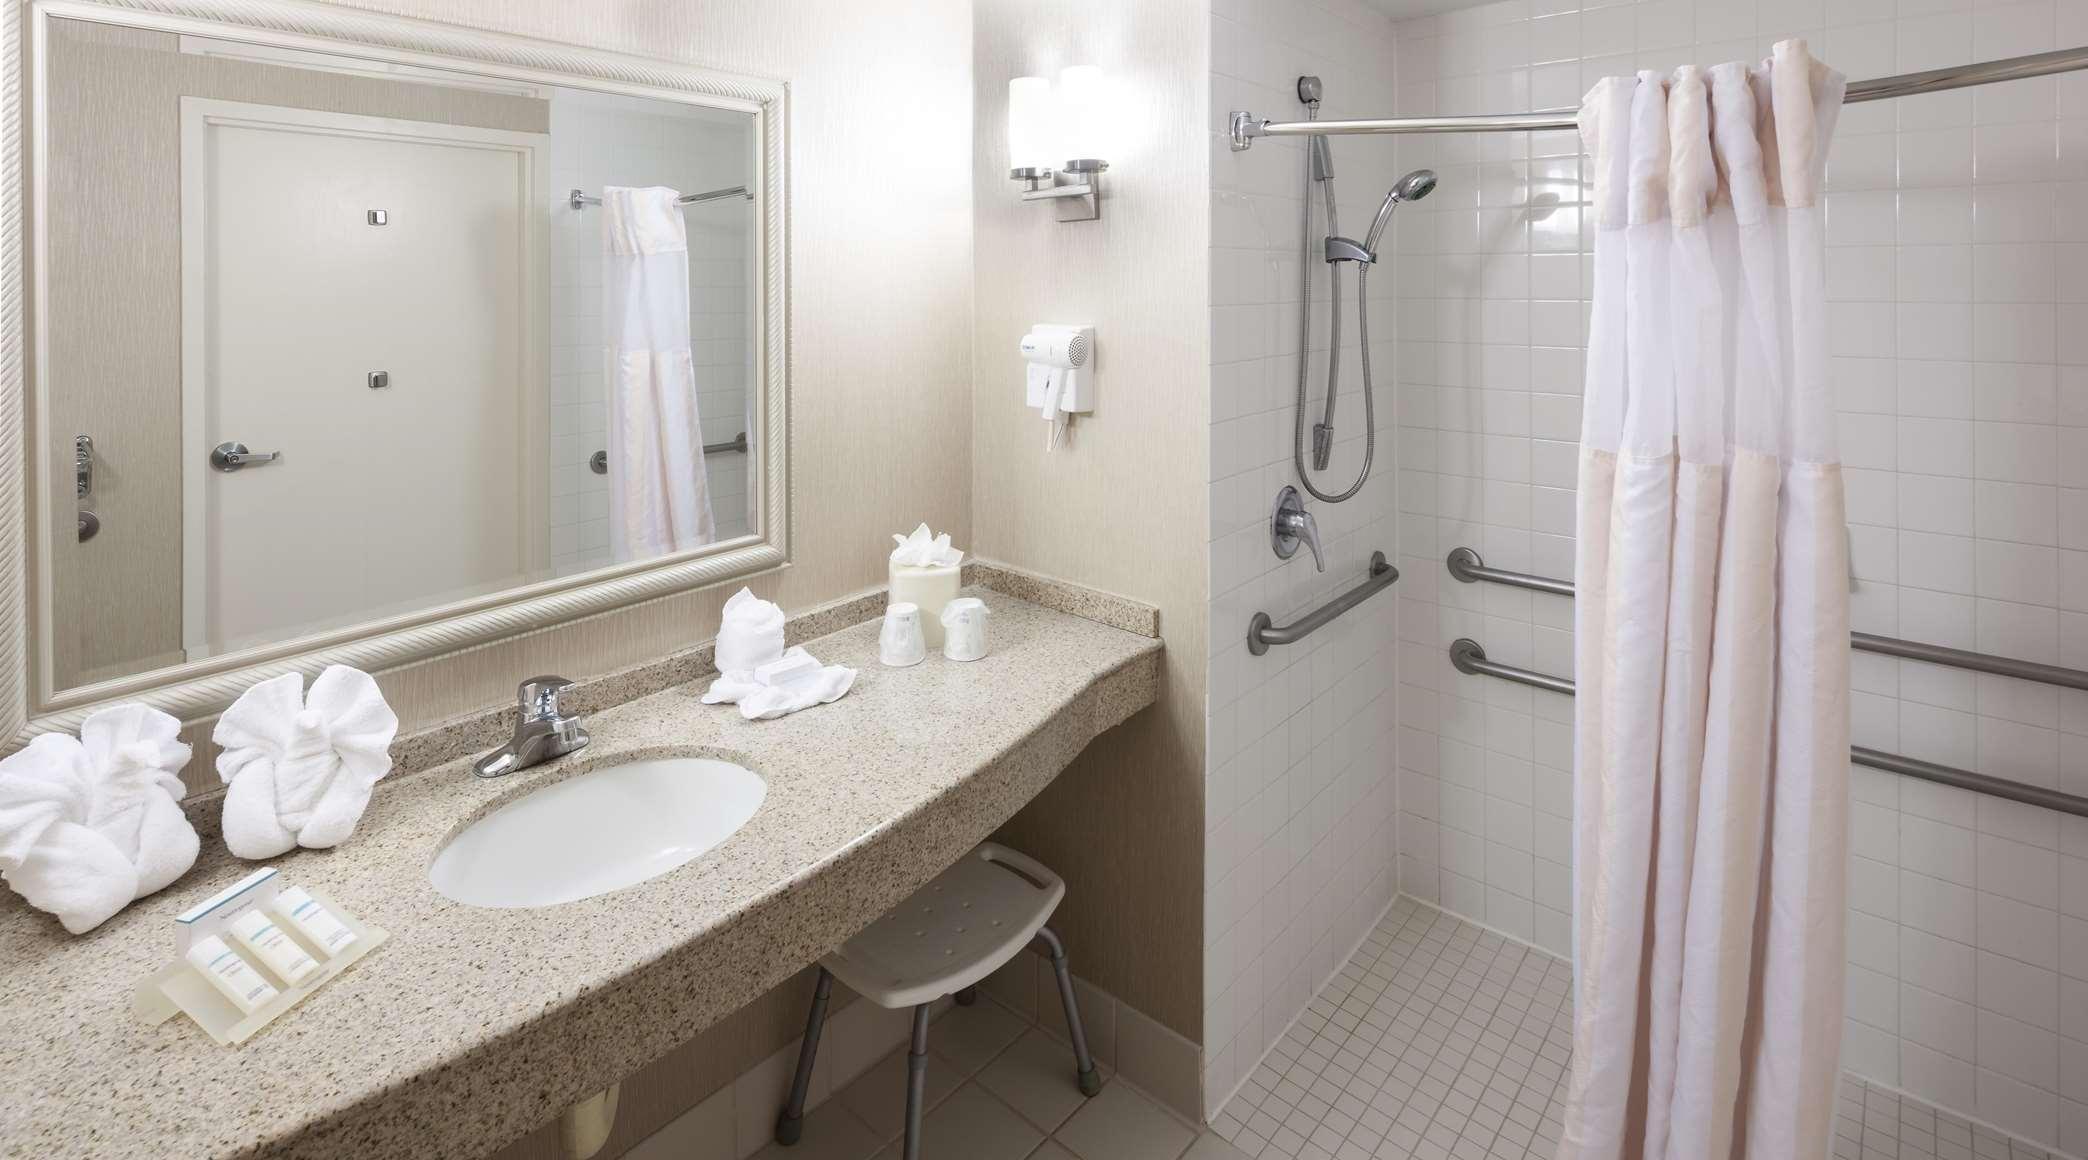 Hilton Garden Inn Rockaway image 19